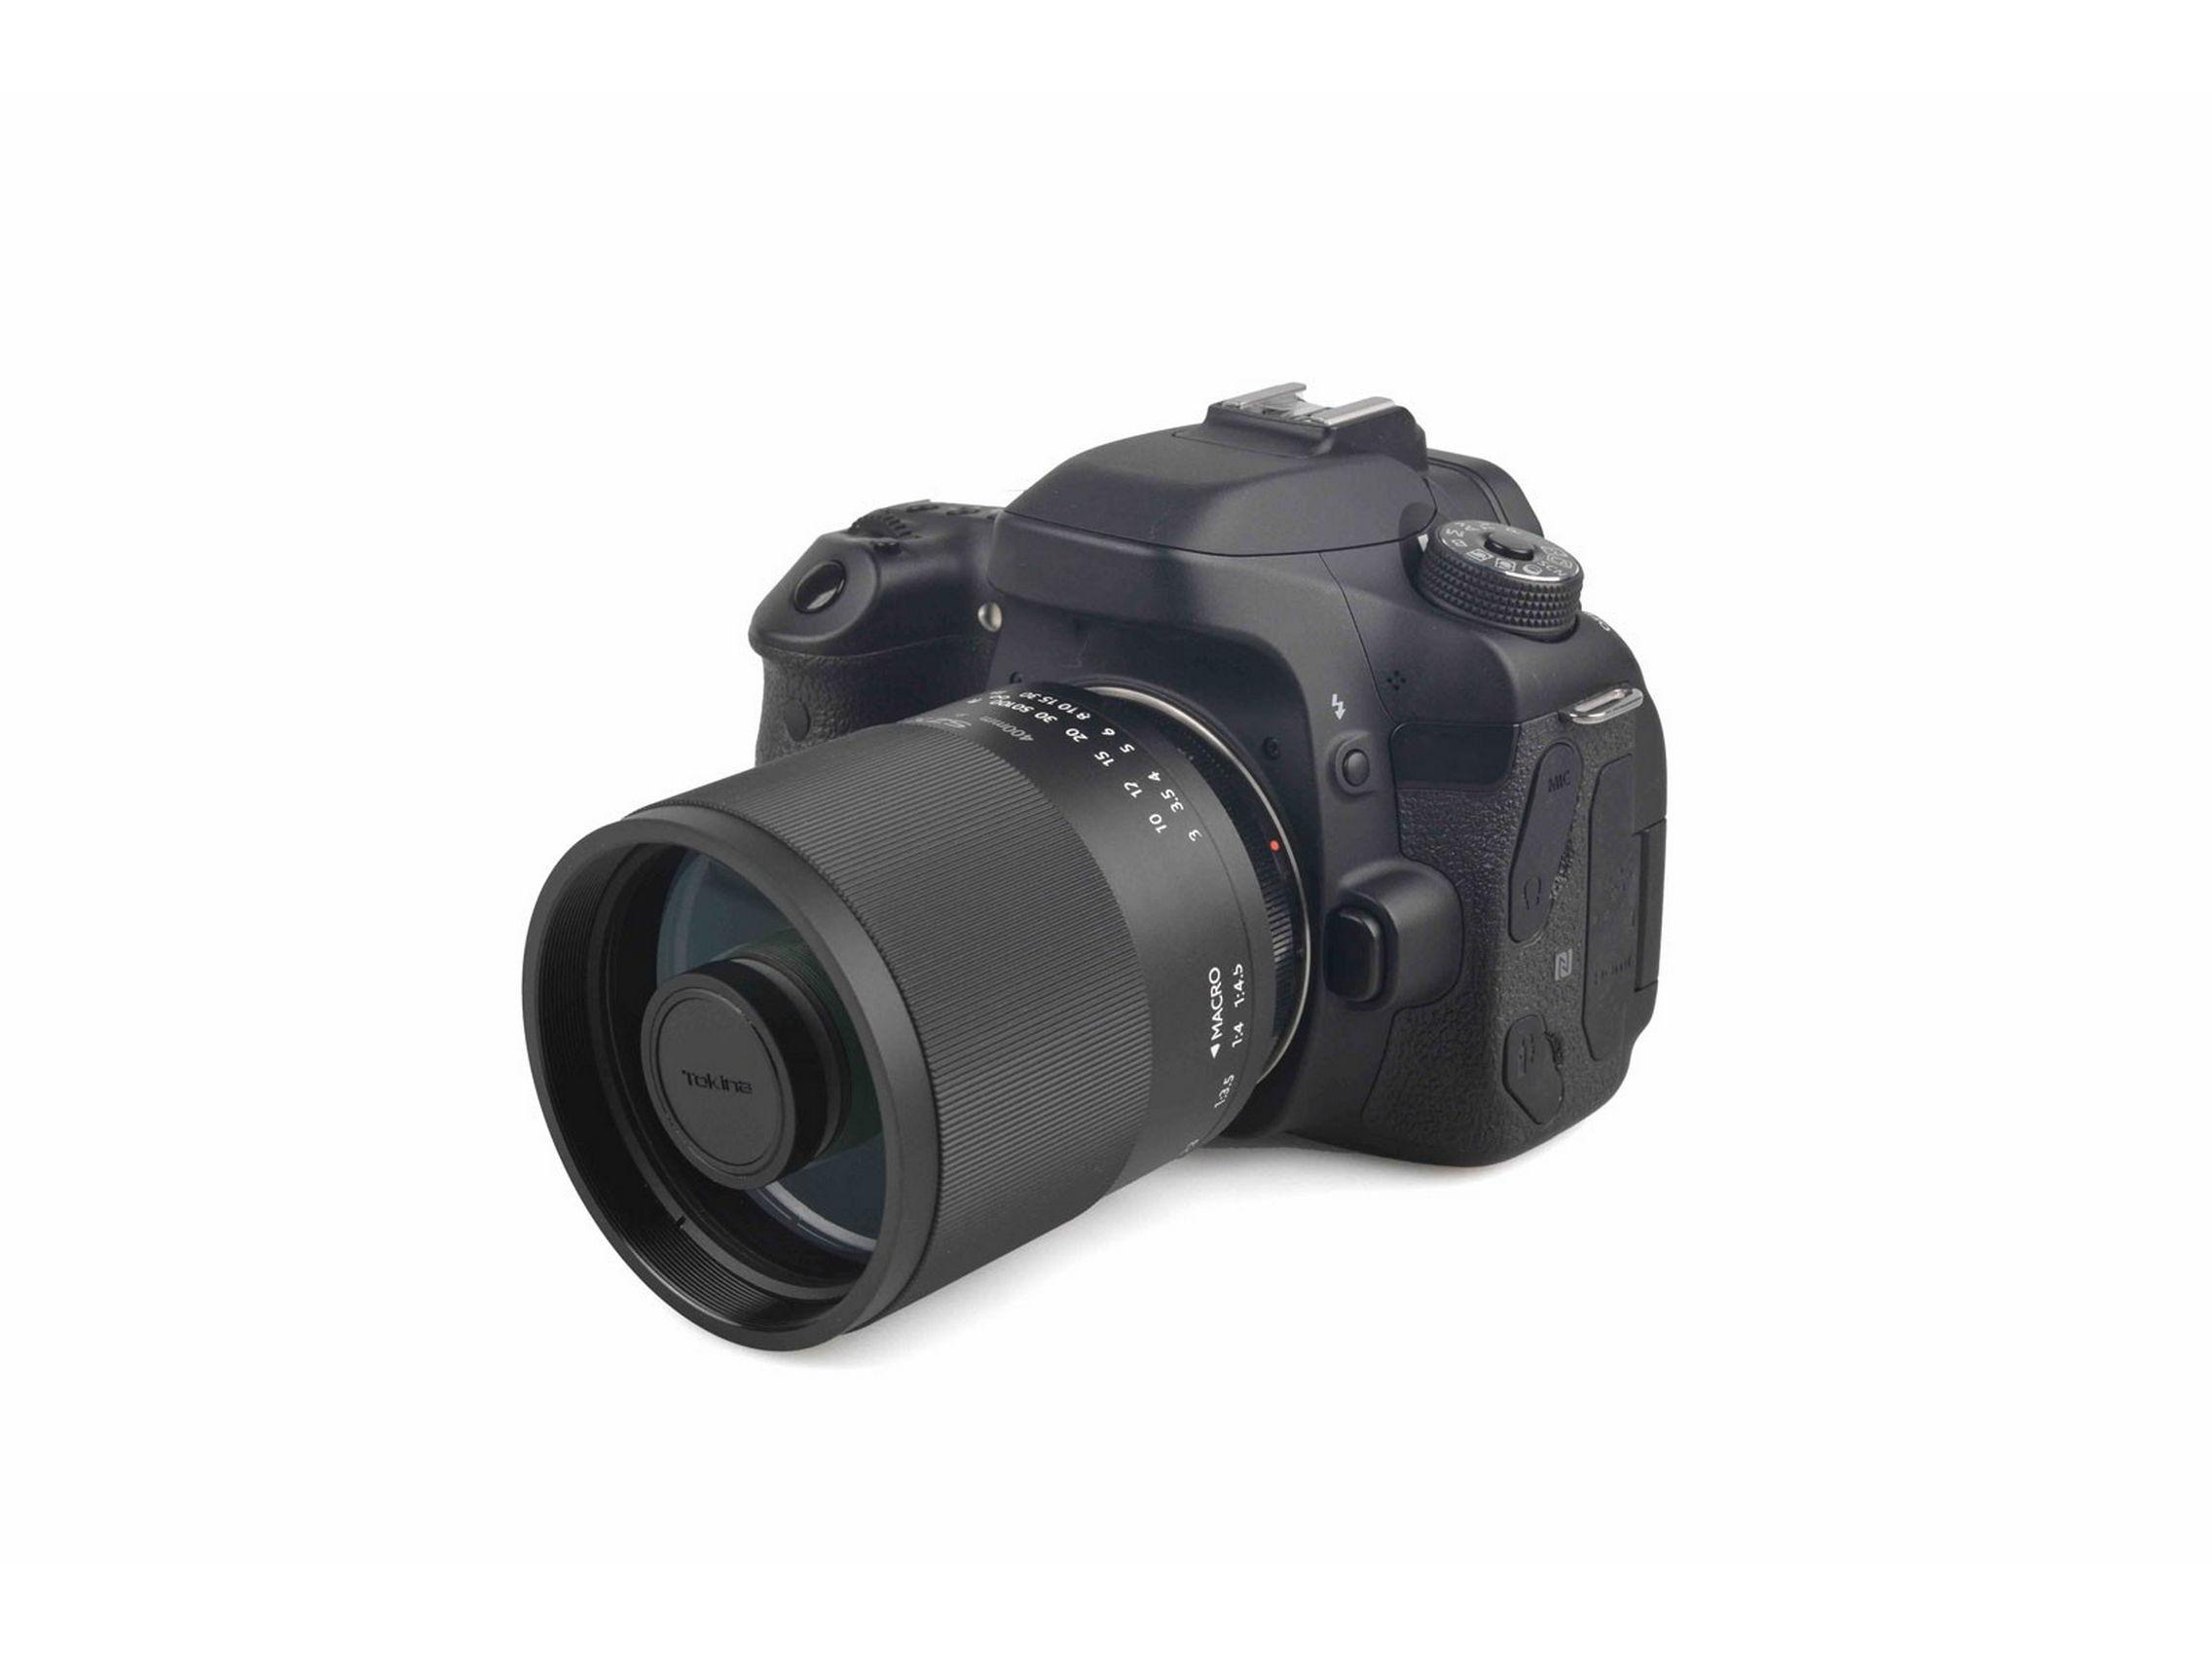 Tokina SZX 400mm F8 Feflex MF